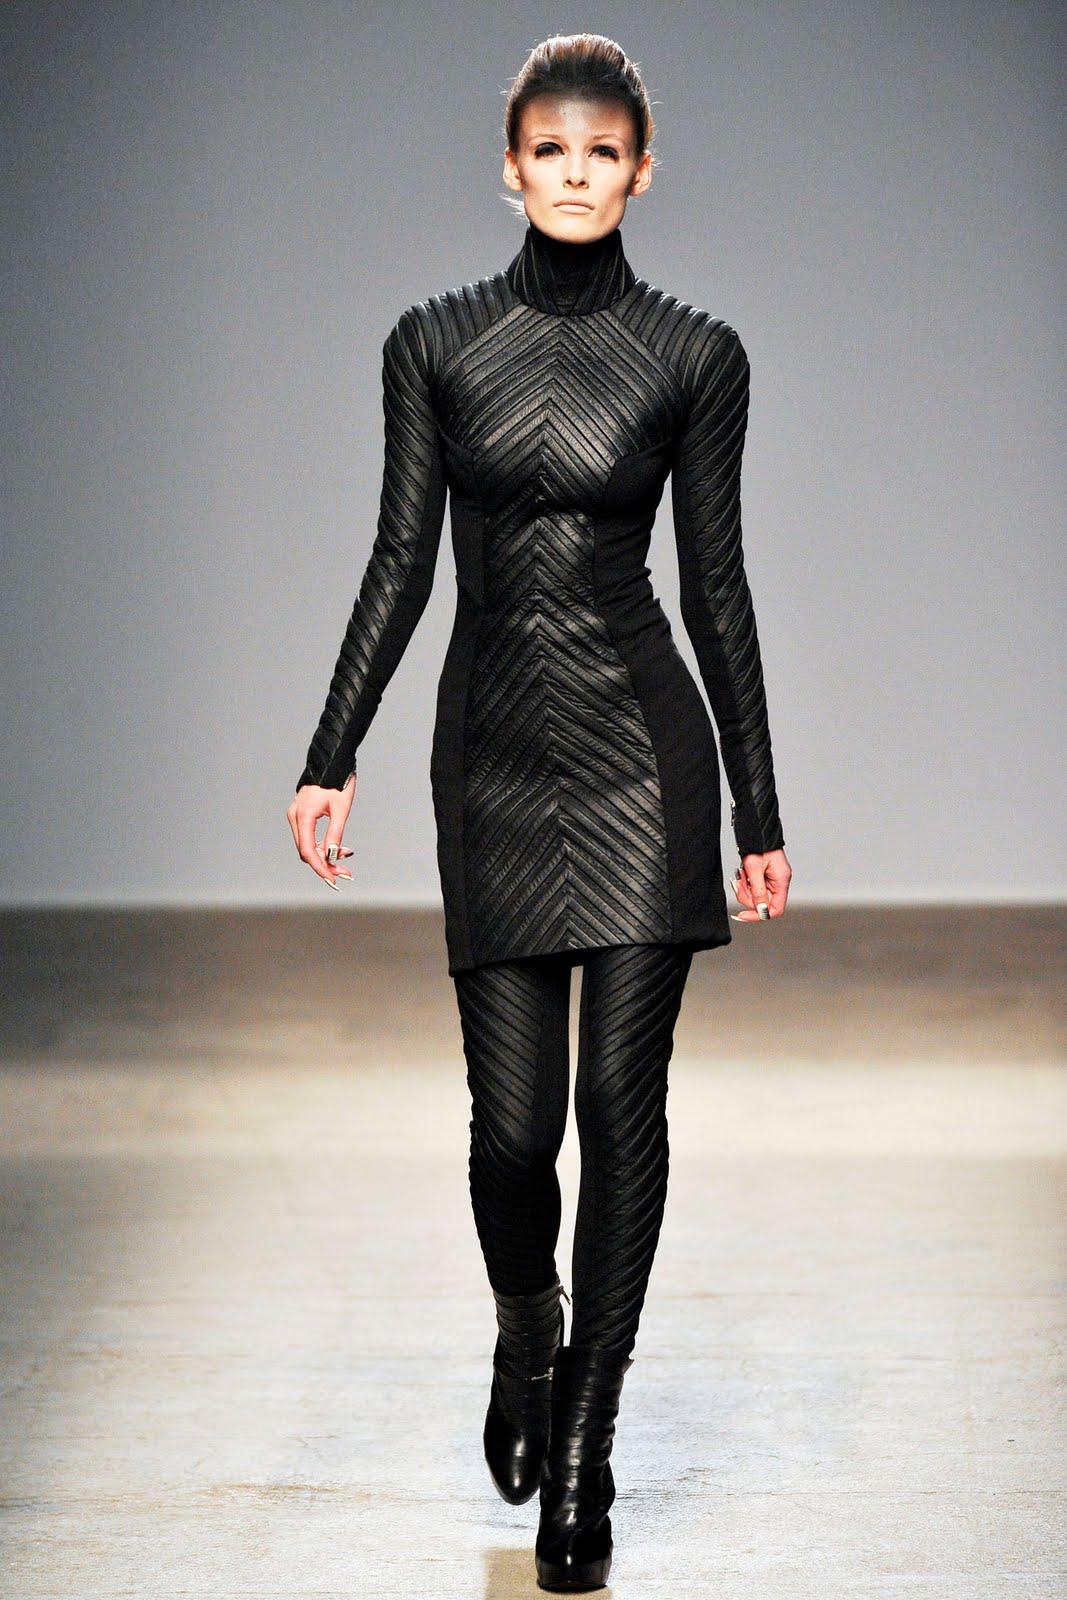 dior black dress 2017